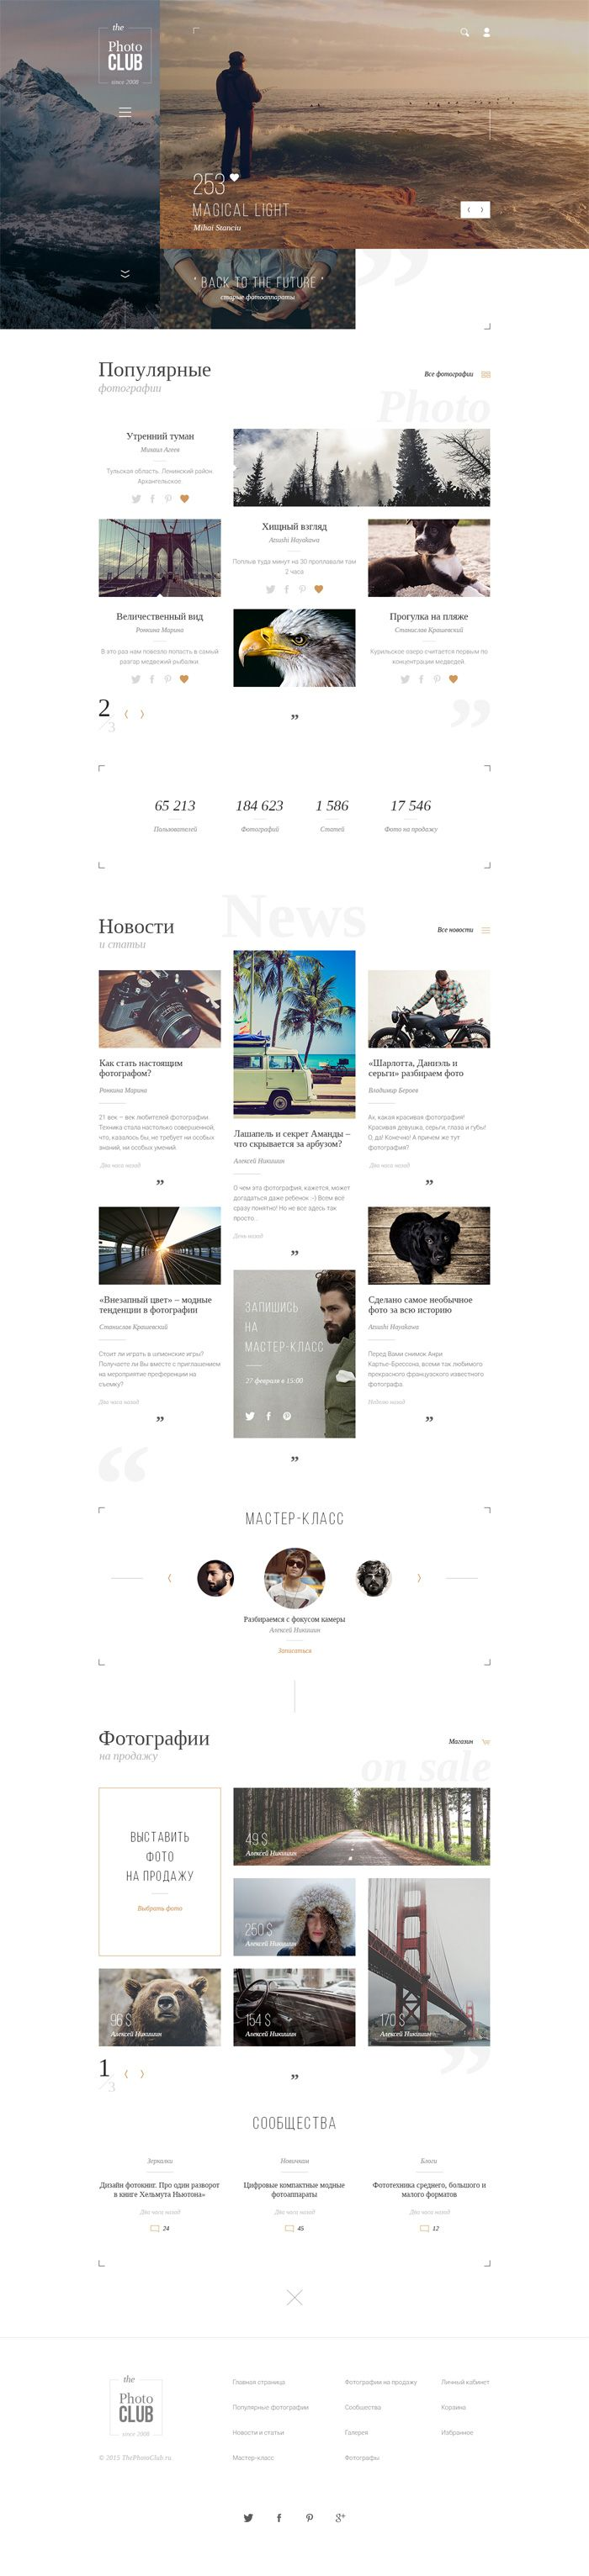 Photo Club by Anton Skvortsov #web #webdesign #design #layout #grid #blog